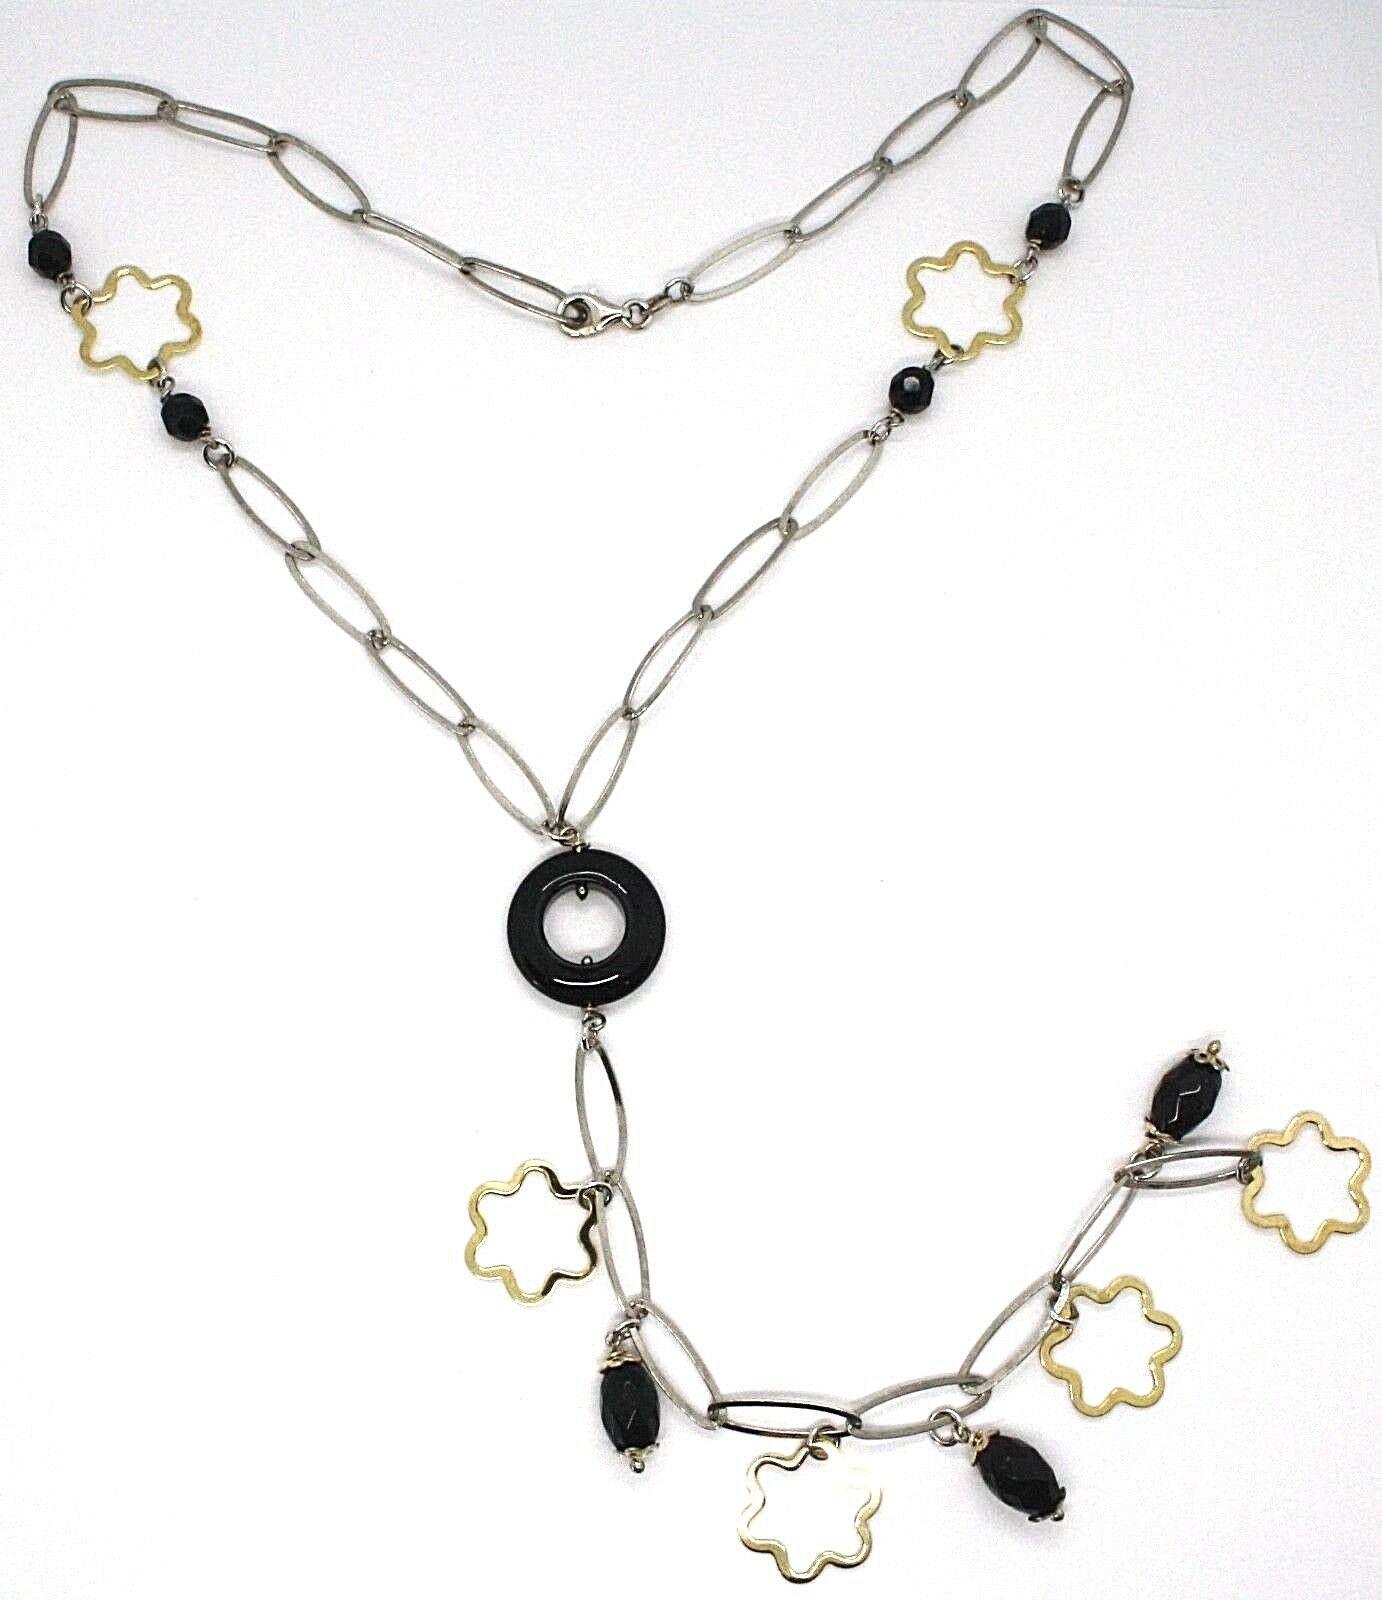 Silver 925 Necklace, Black Onyx, Pendant Flowers, Daisy, Waterfall